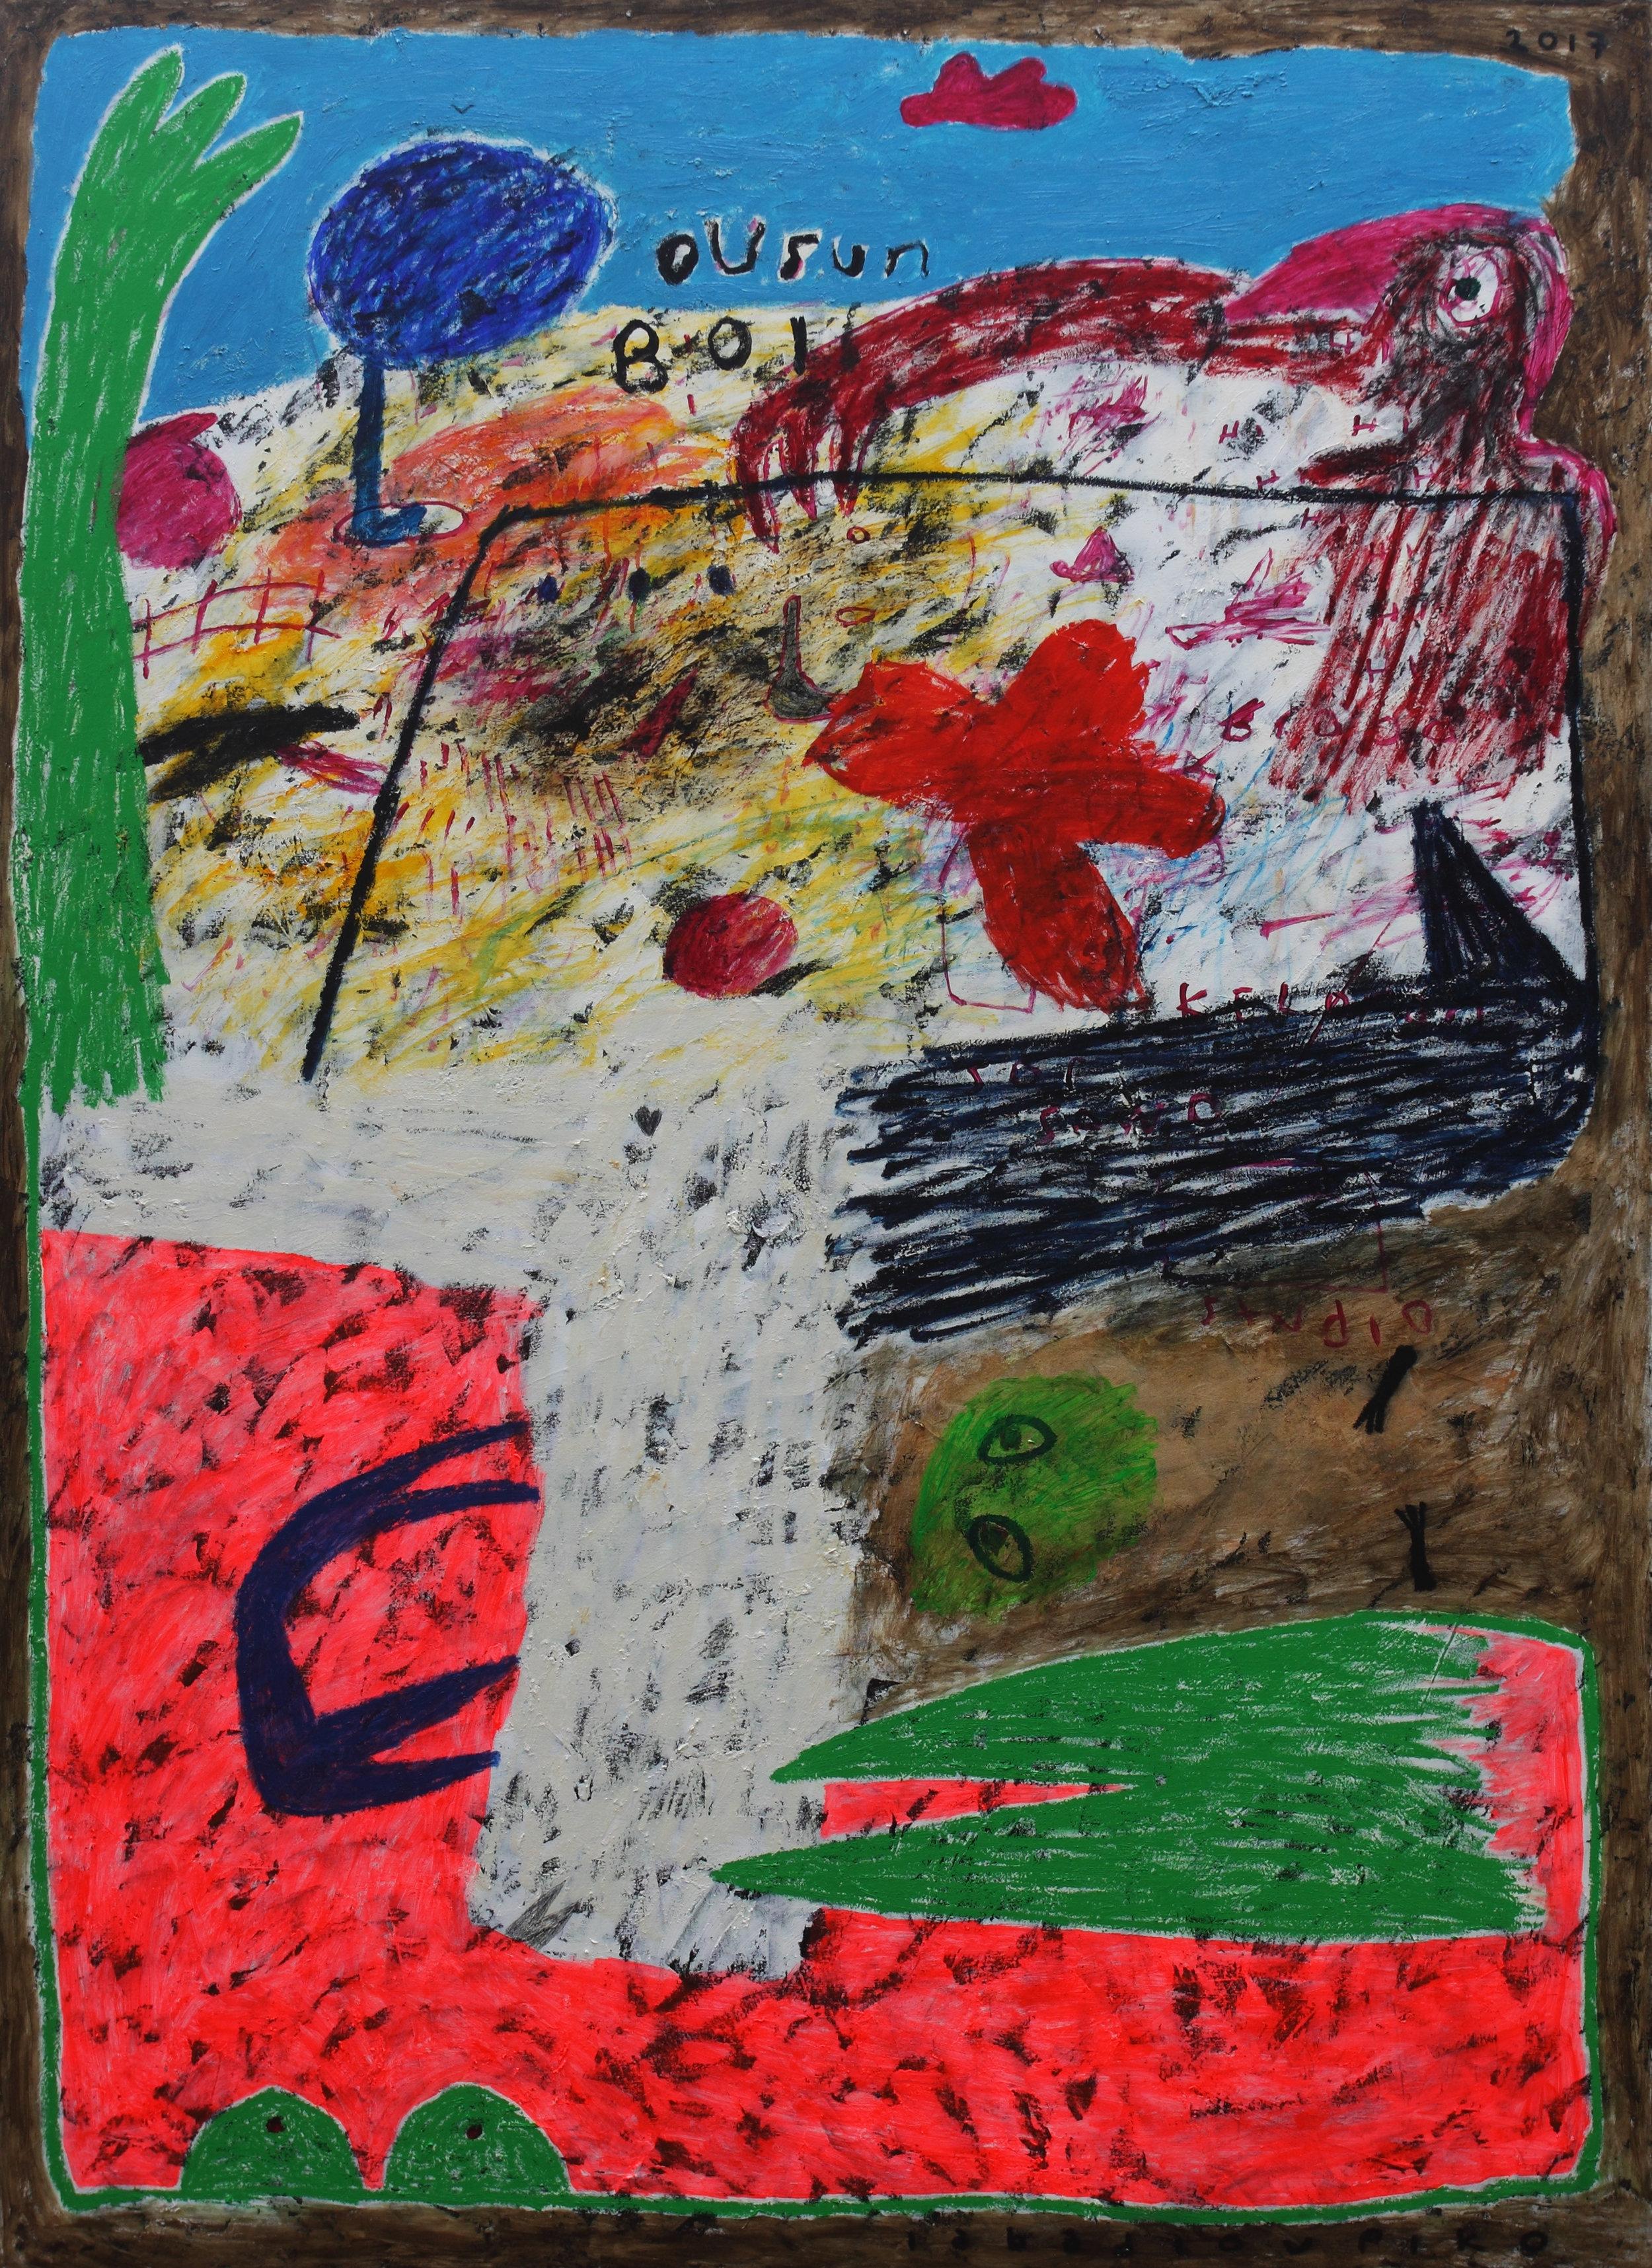 Iabadiou Piko, b.1984 (INDONESIA)  Title: Batas Tanpa Tepi  Medium: Acrylic, Bitumen, Oil Bar, Oil on Canvas  Dimension: 200 x 145 cm  Year: 2017